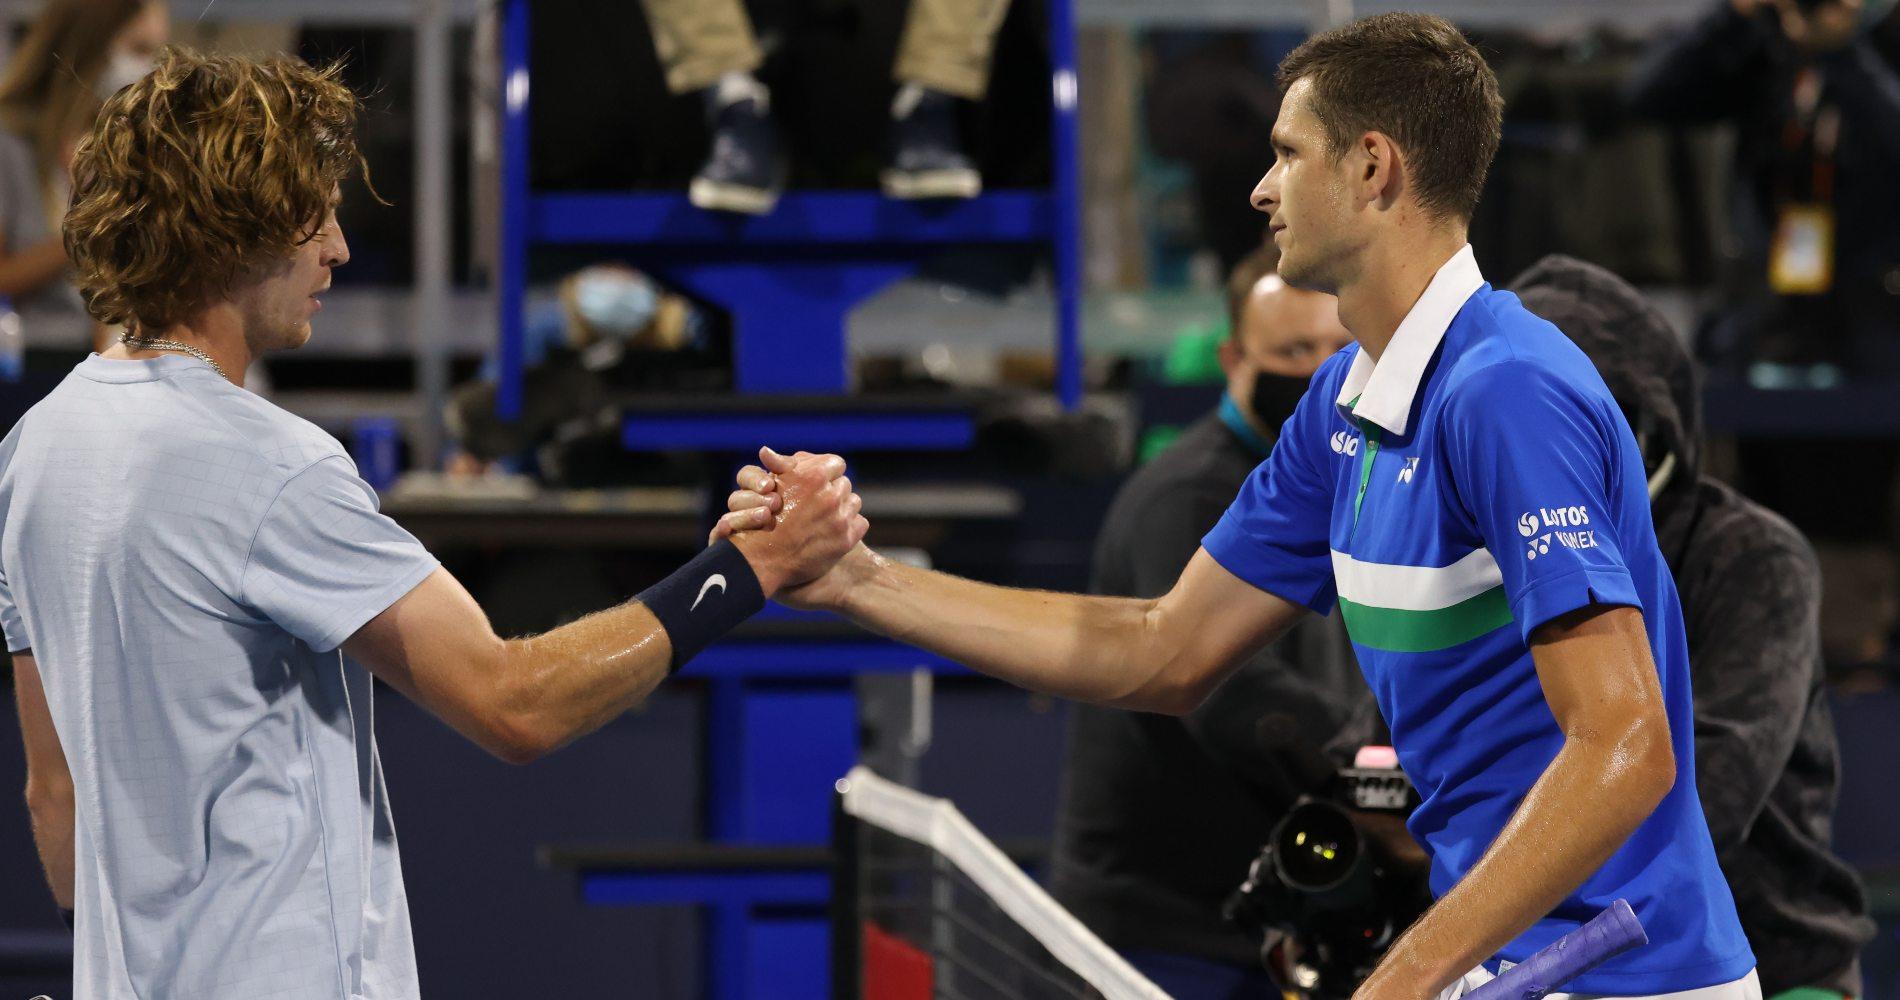 Andrey Rublev & Hubert Hurkacz, Miami, 2021